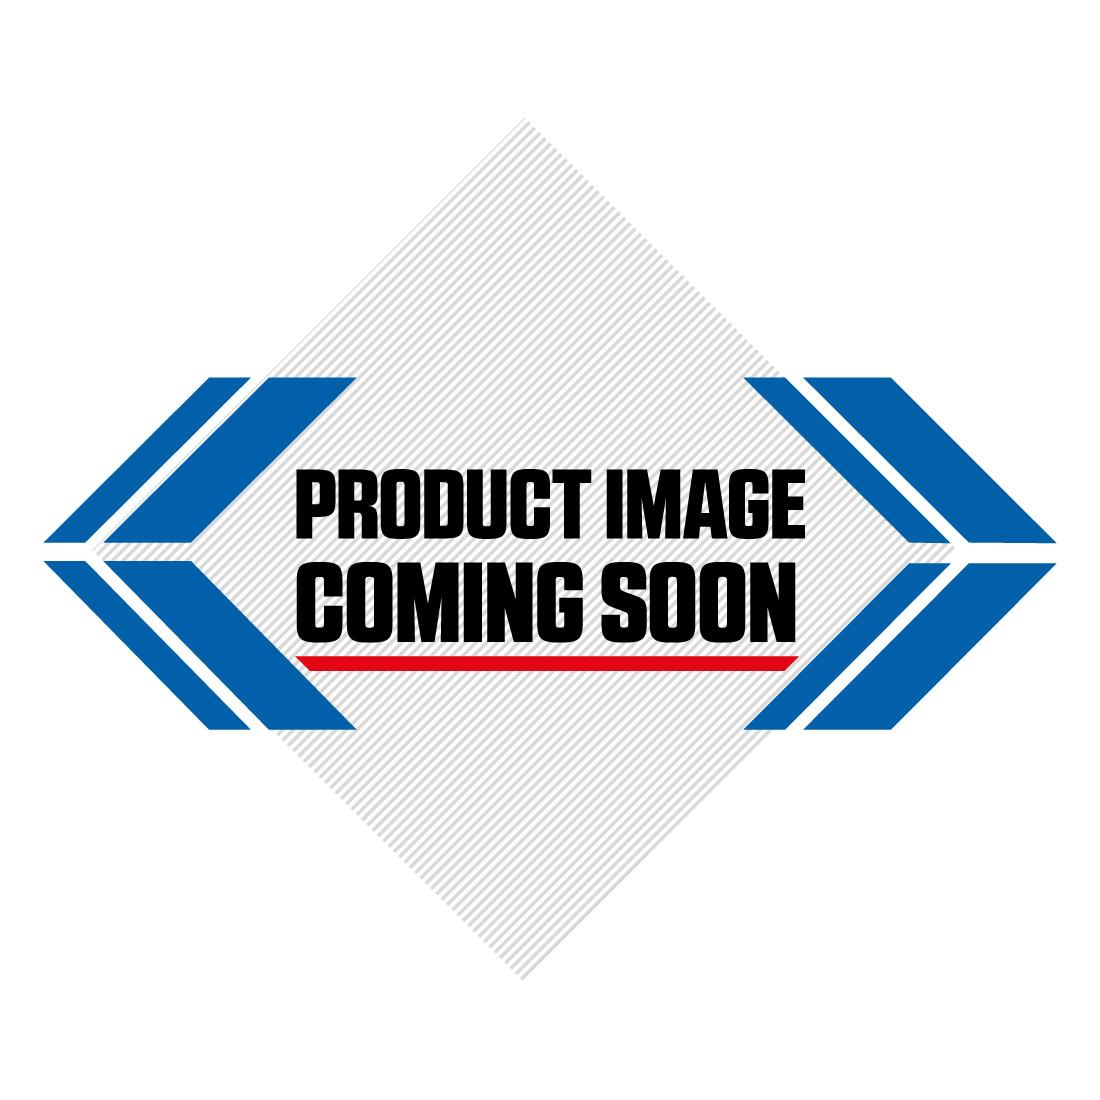 Renthal Twinring Rear Sprocket KTM SX SX-F EXC EXC-F Husqvarna TC FC TE FE - Orange